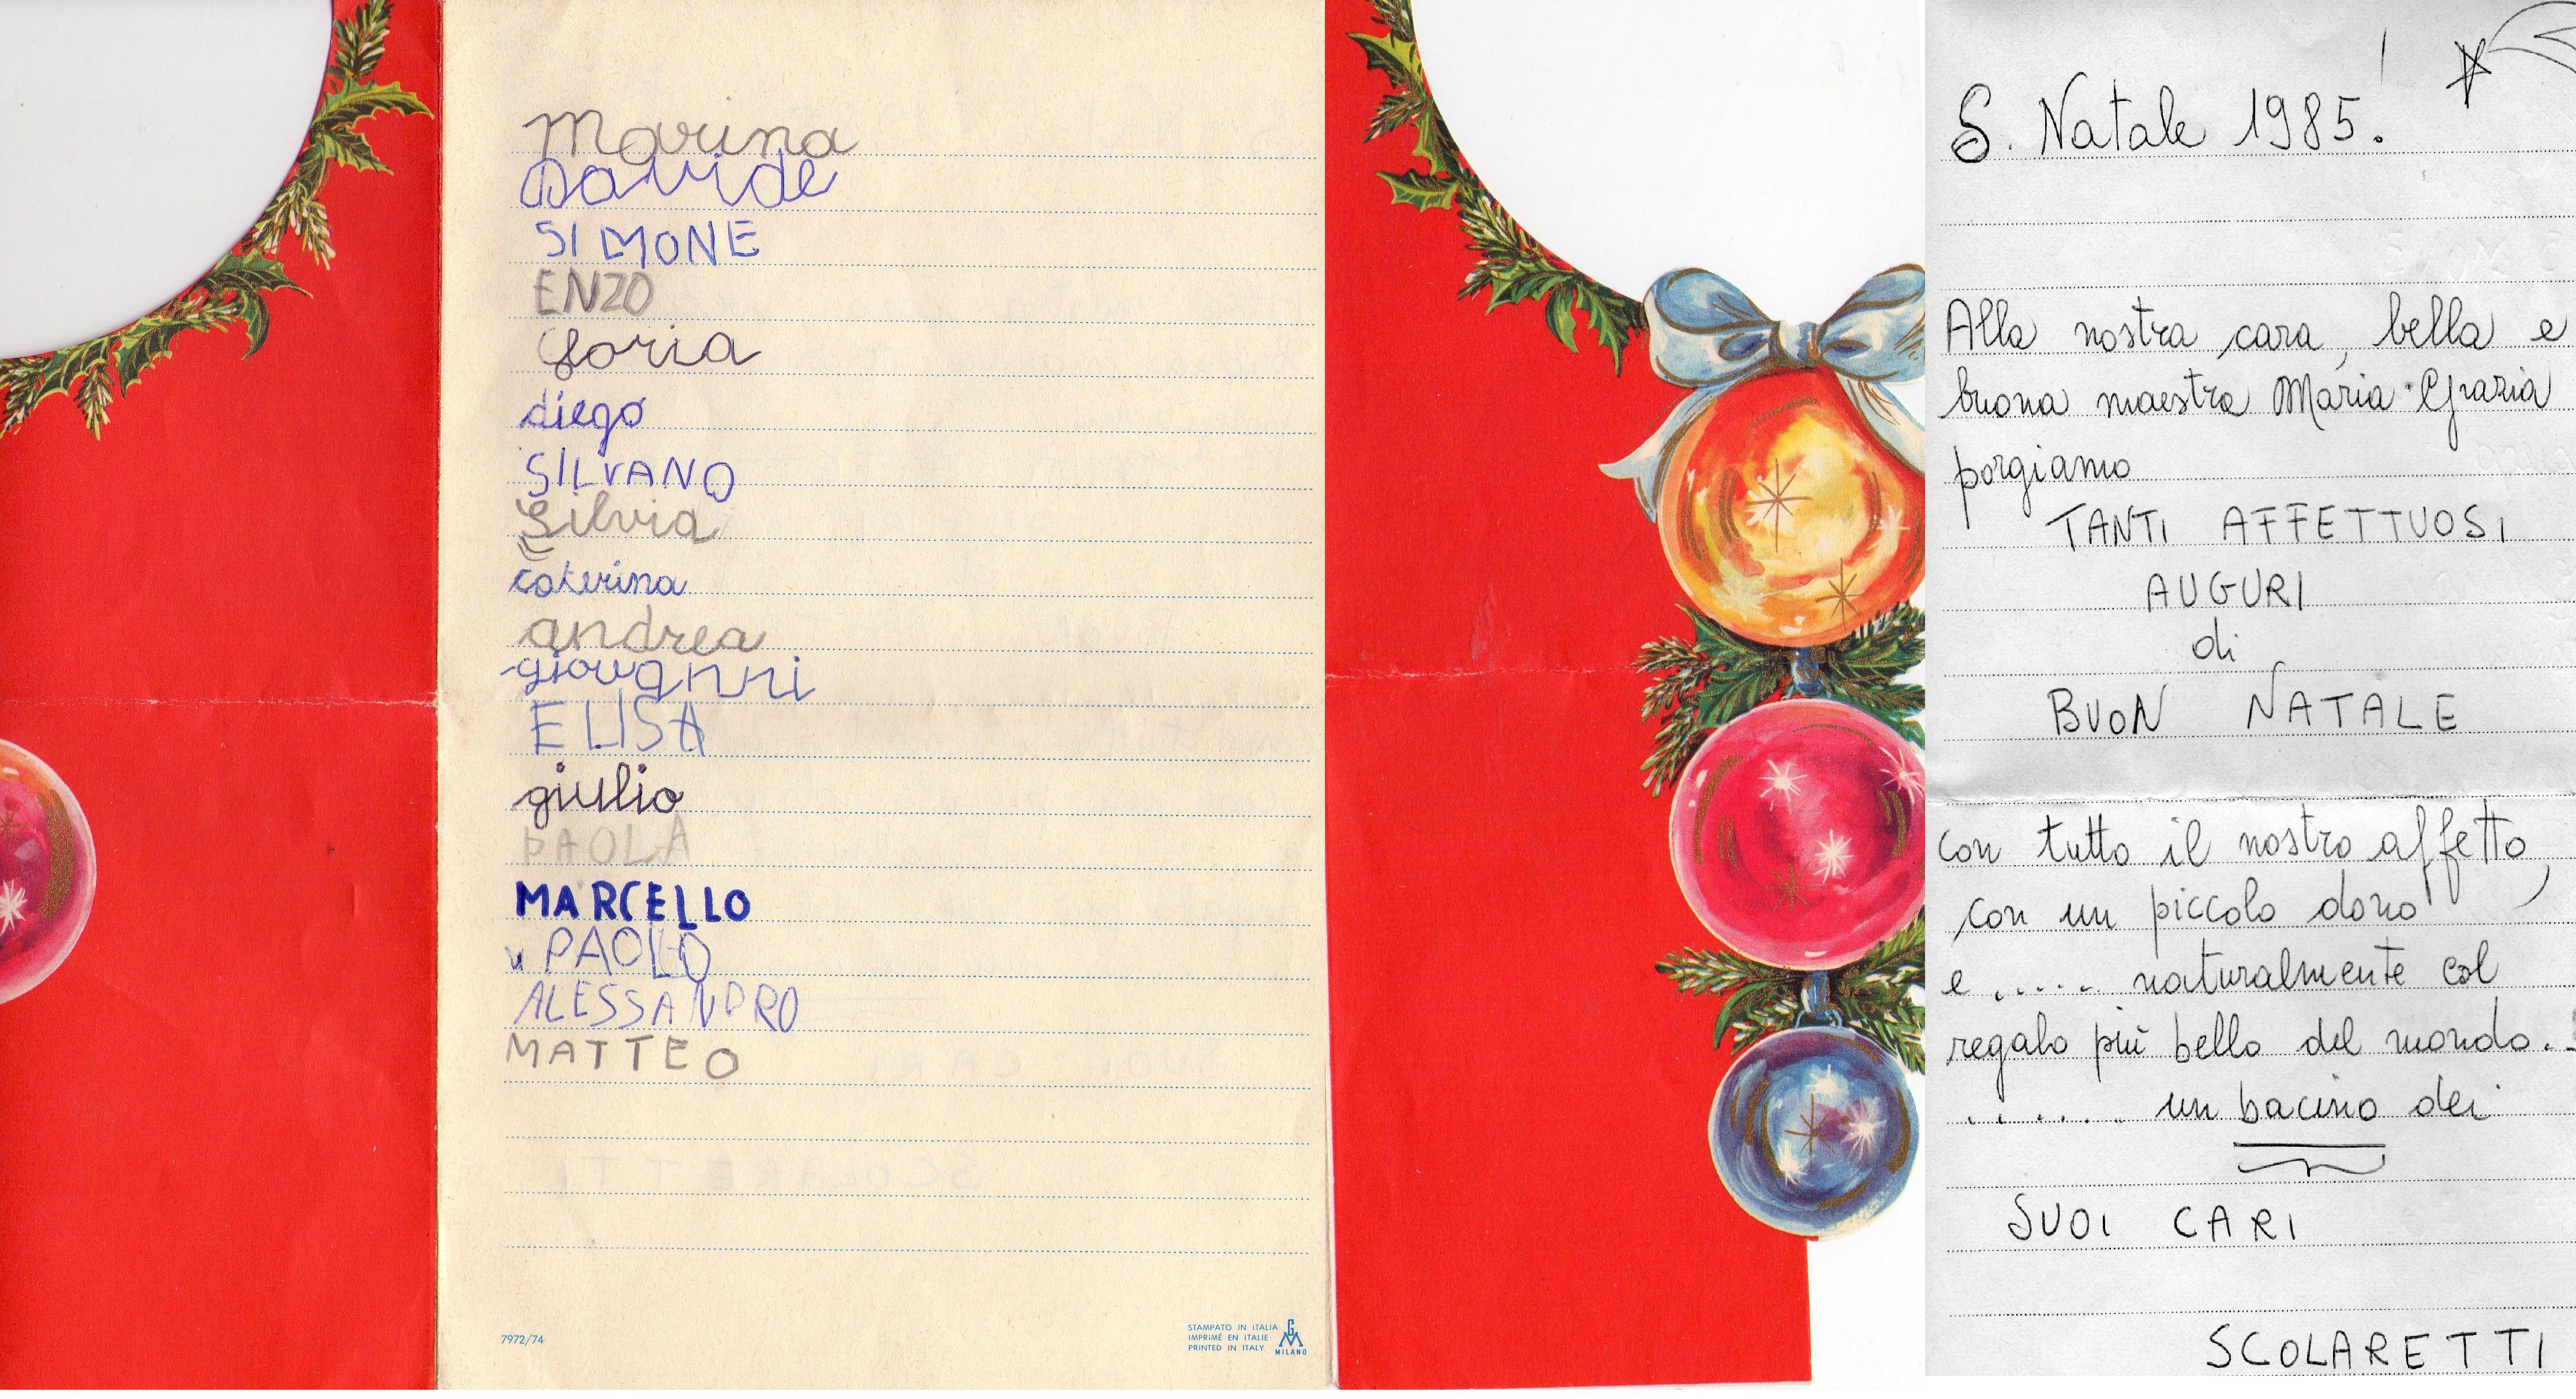 Auguri  S.Natale 1985 cl 1B